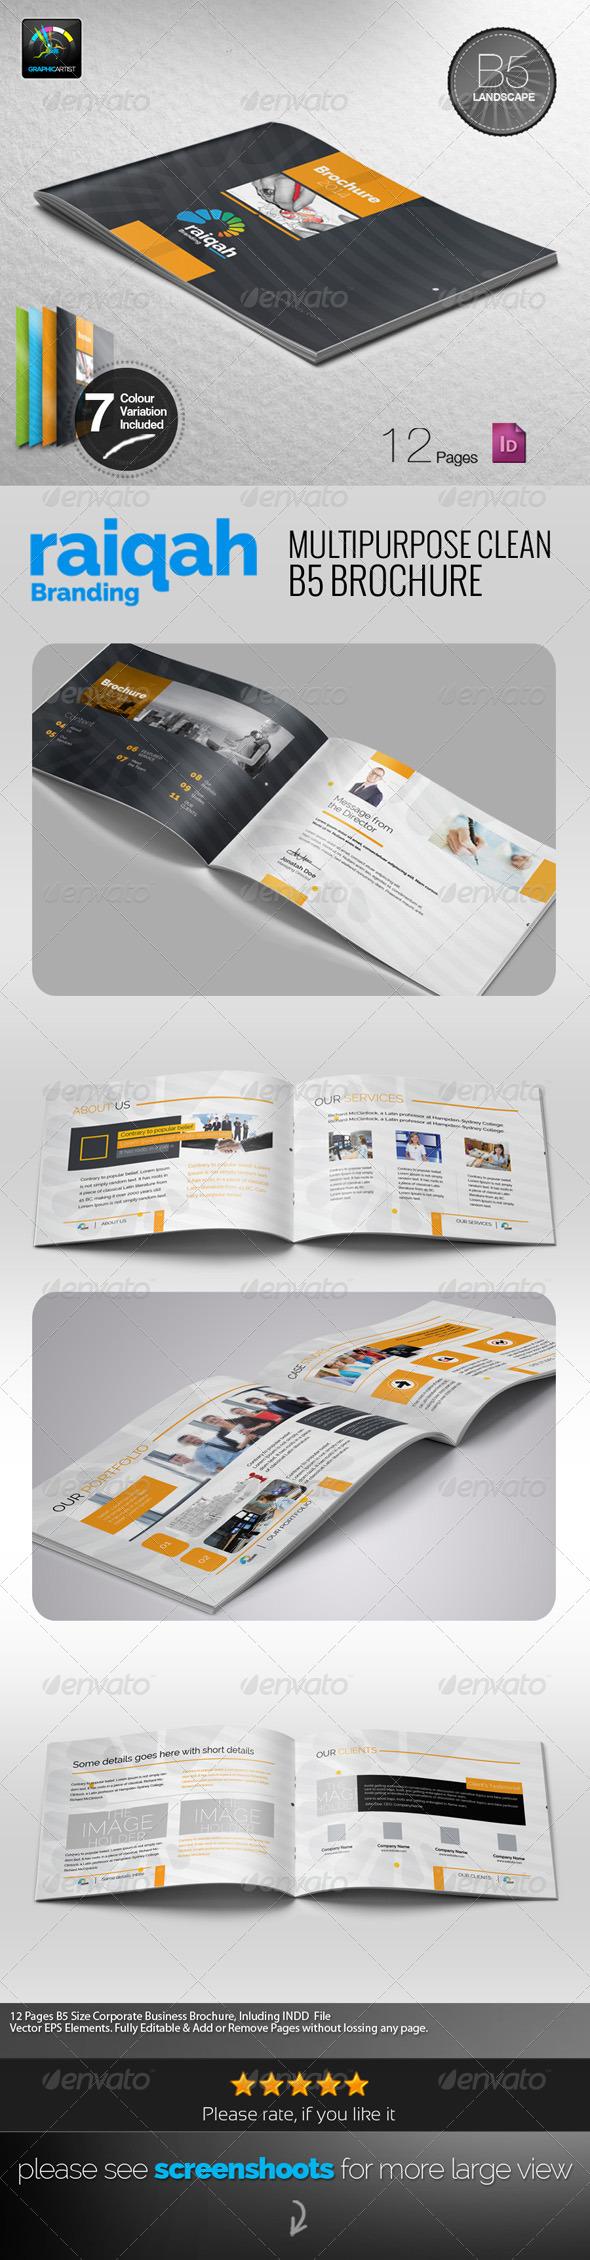 GraphicRiver Raiqah Multipurpose B5 Brochure 7638414